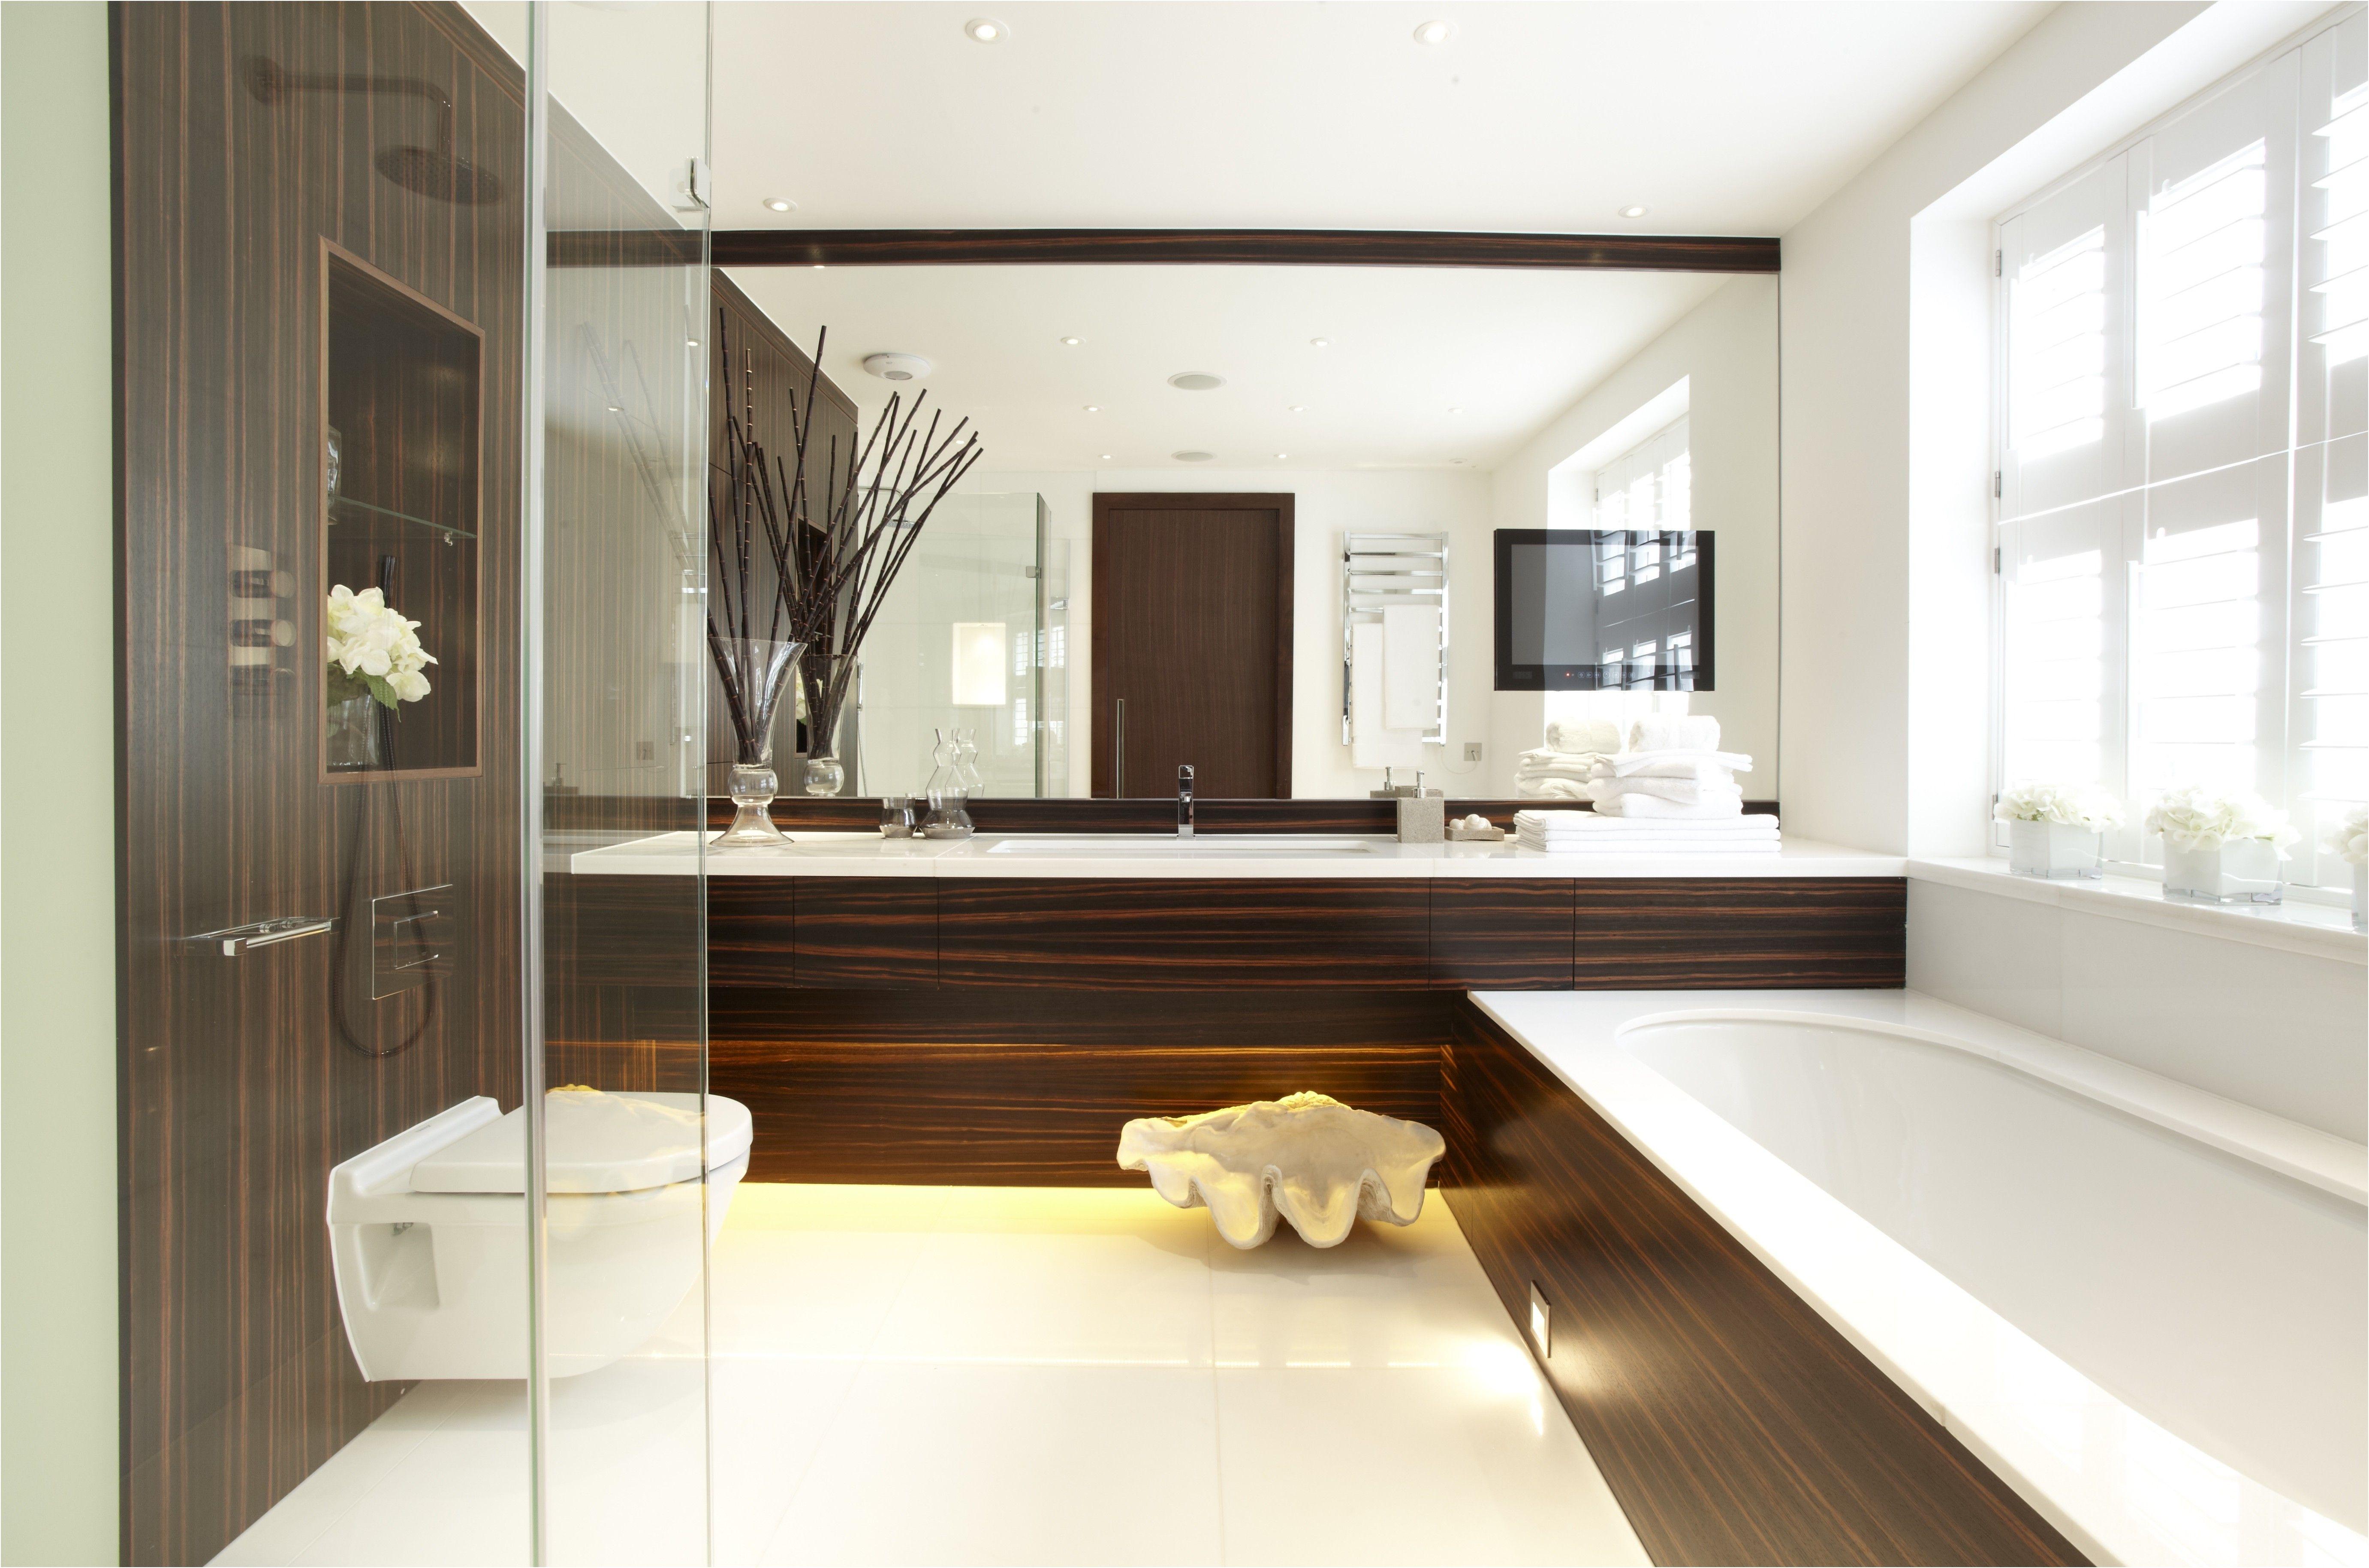 rukle online bathrooms render planner neat for as amusing d australian res interior high design bathroom closet ikea app tool well decorative designer